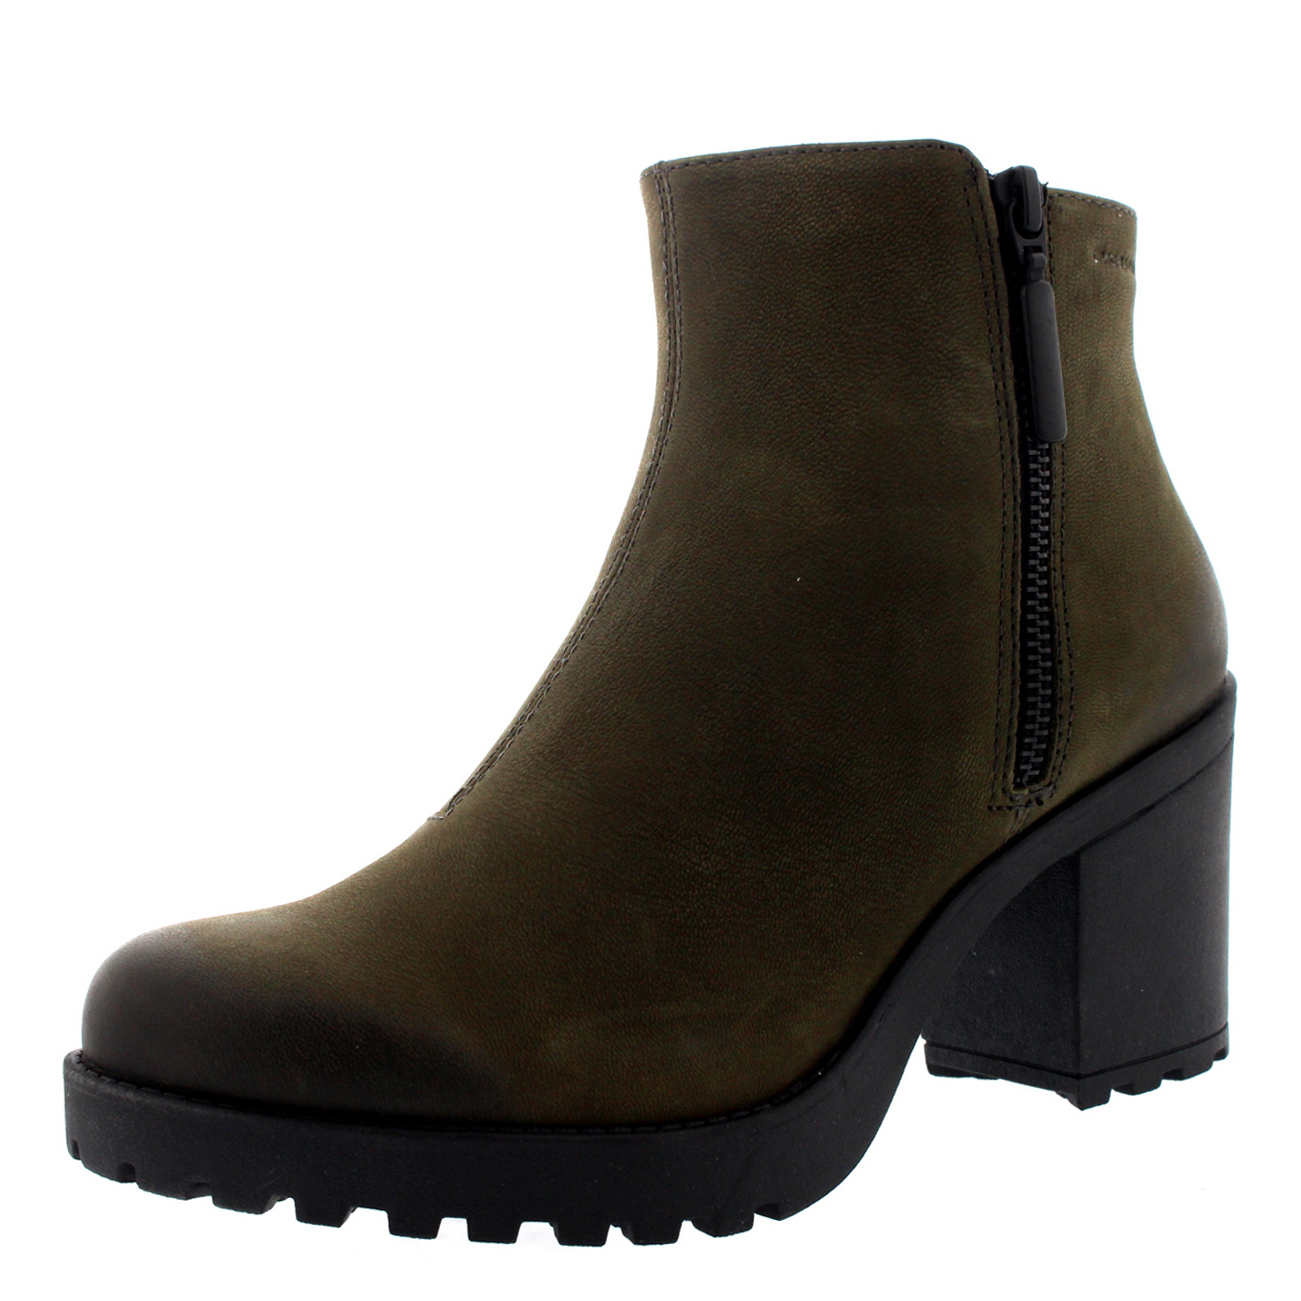 Womens Vagabond Grace Suede Festival Zip Casual Block Heel Ankle Boots UK 3.5-8